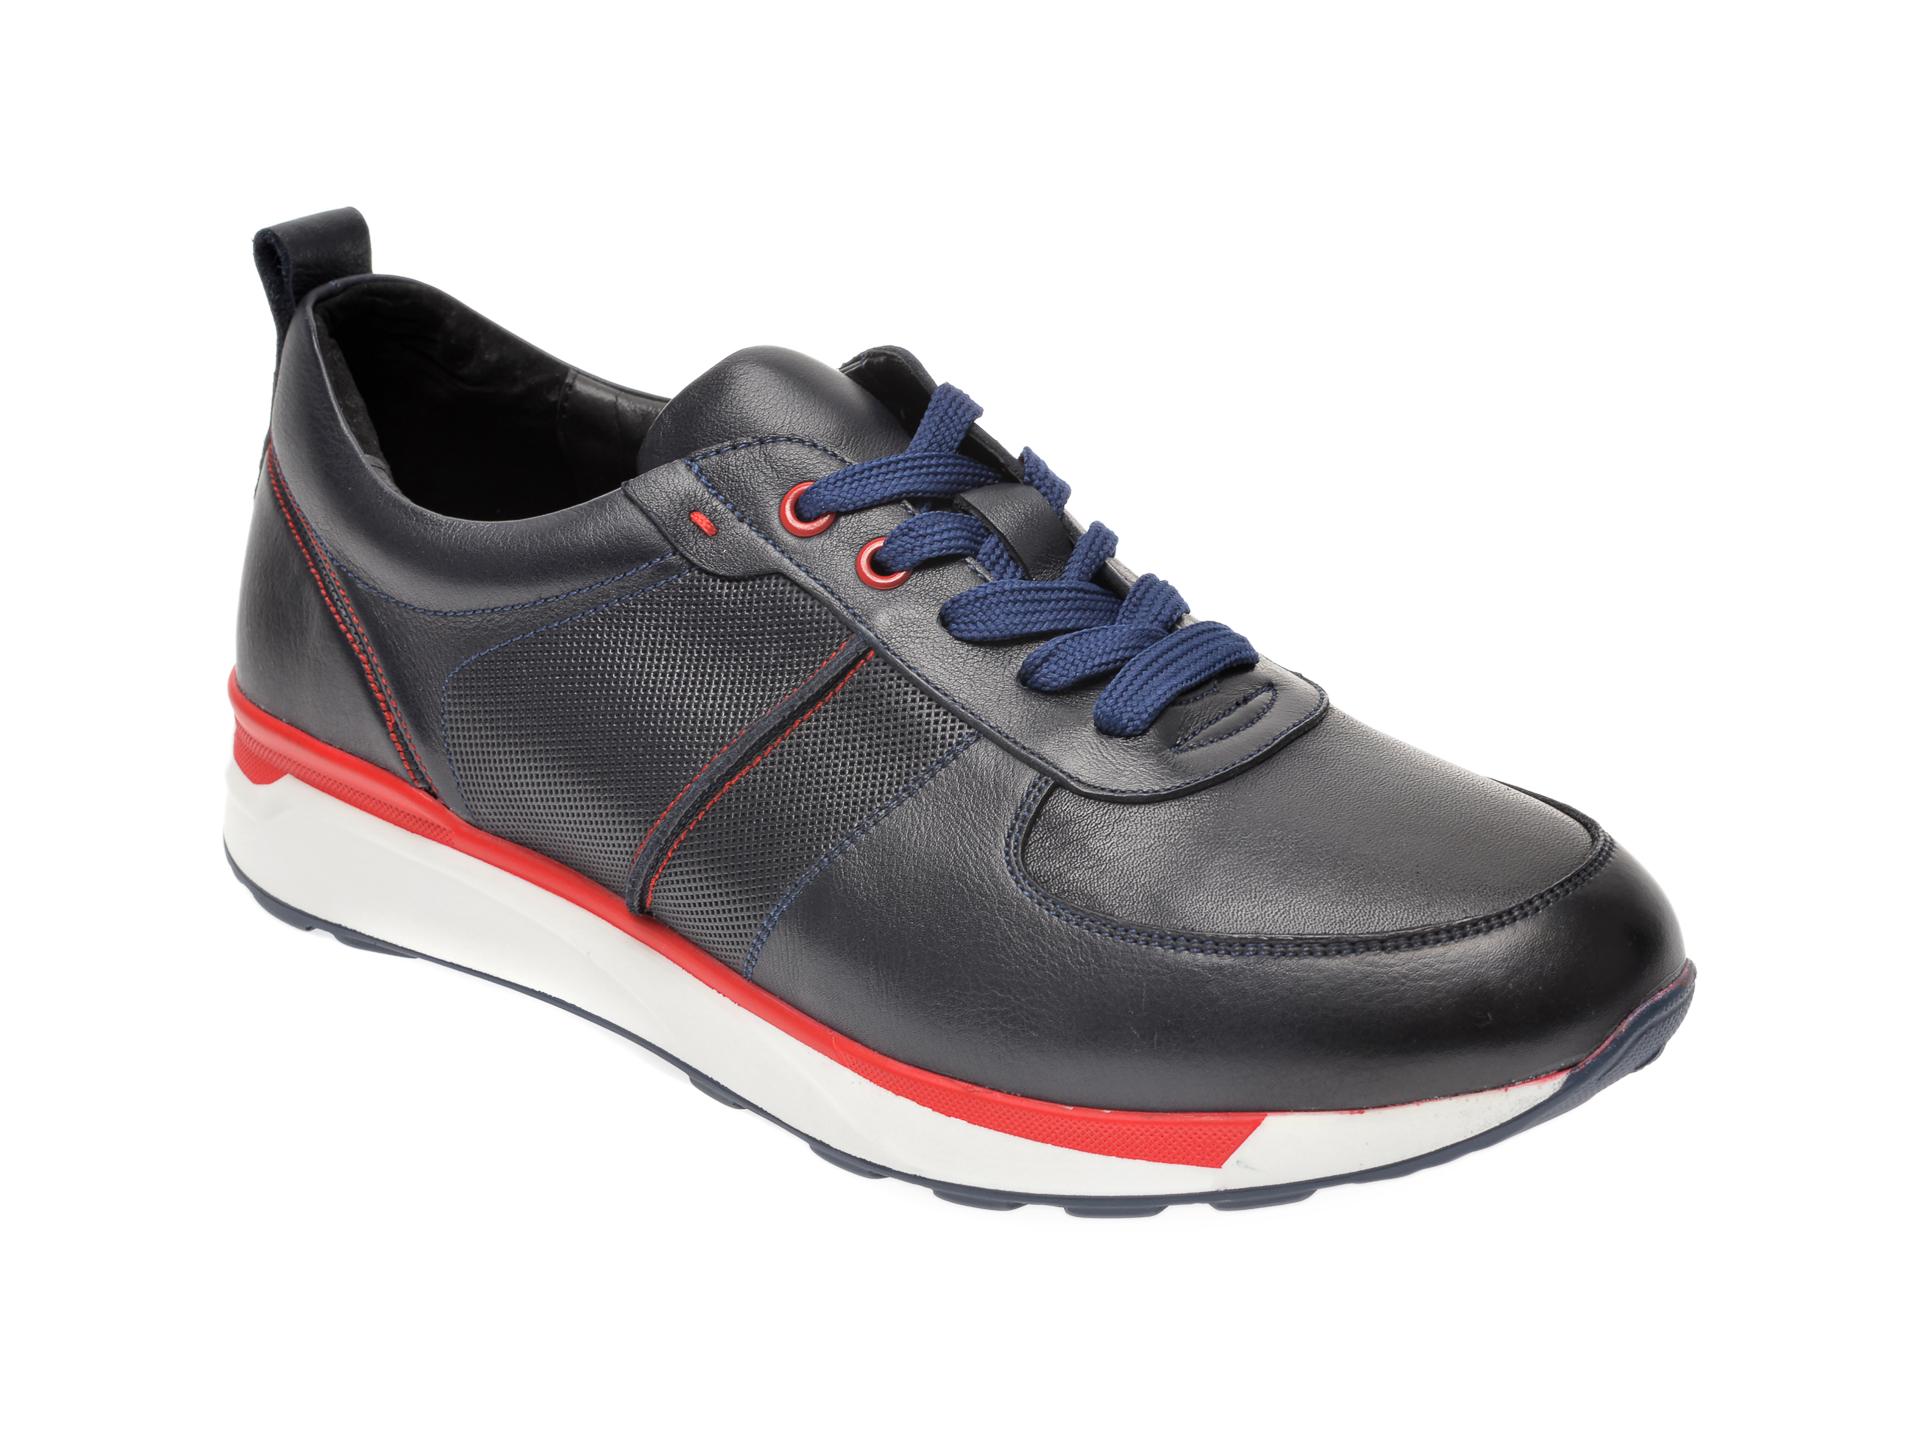 Pantofi OTTER bleumarin, 7D91148, din piele naturala New